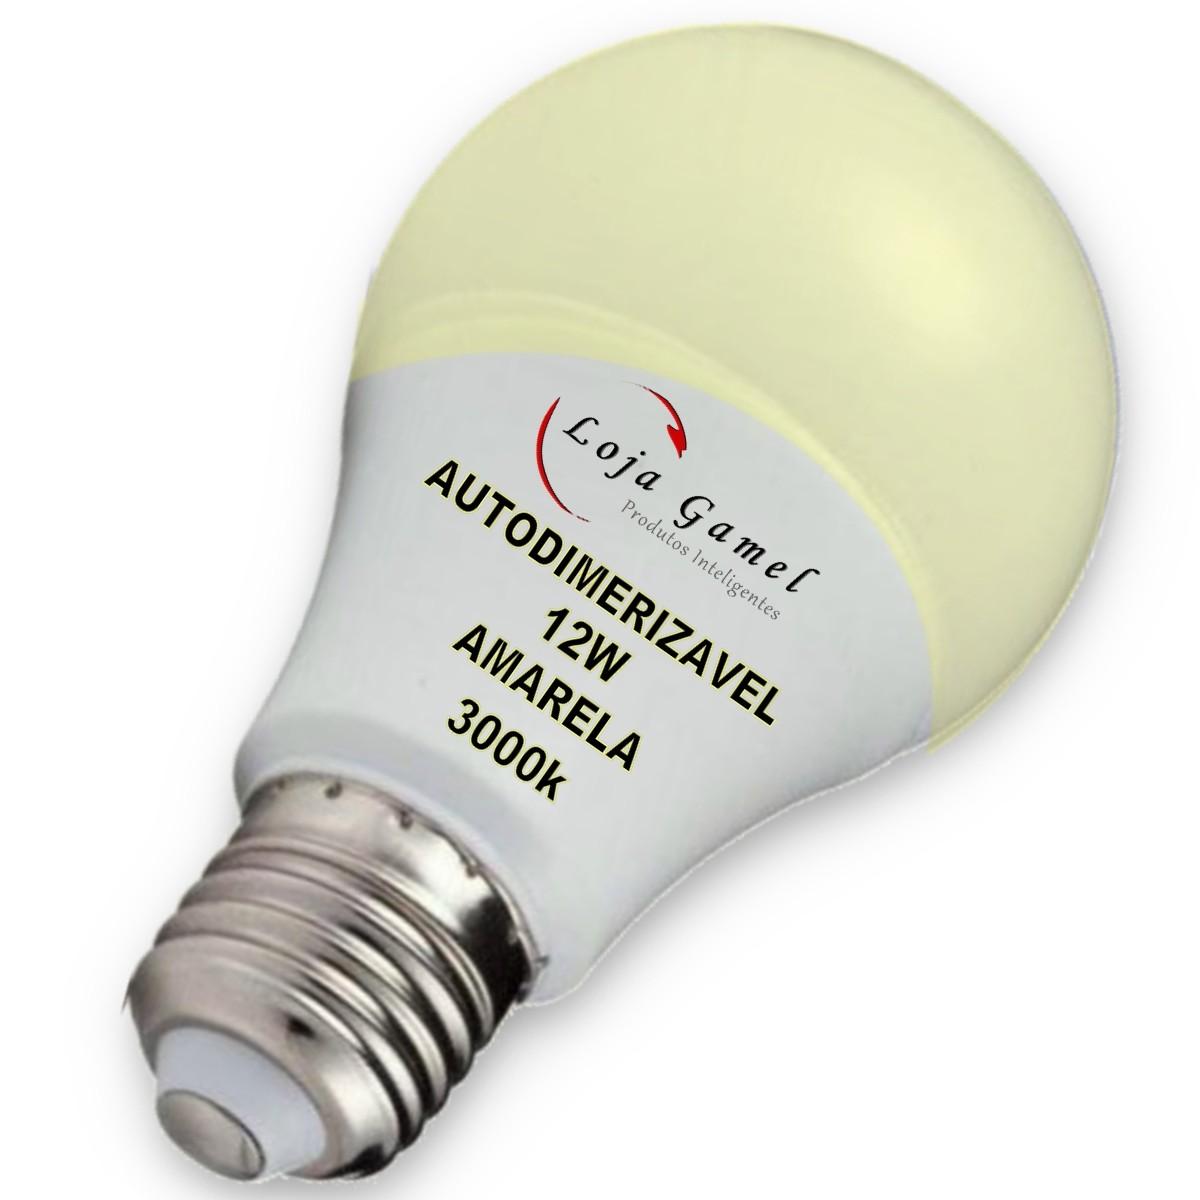 Foto2 - Lâmpada LED Bulbo Autodimerizável 12W Luz Amarela 3000K 10un